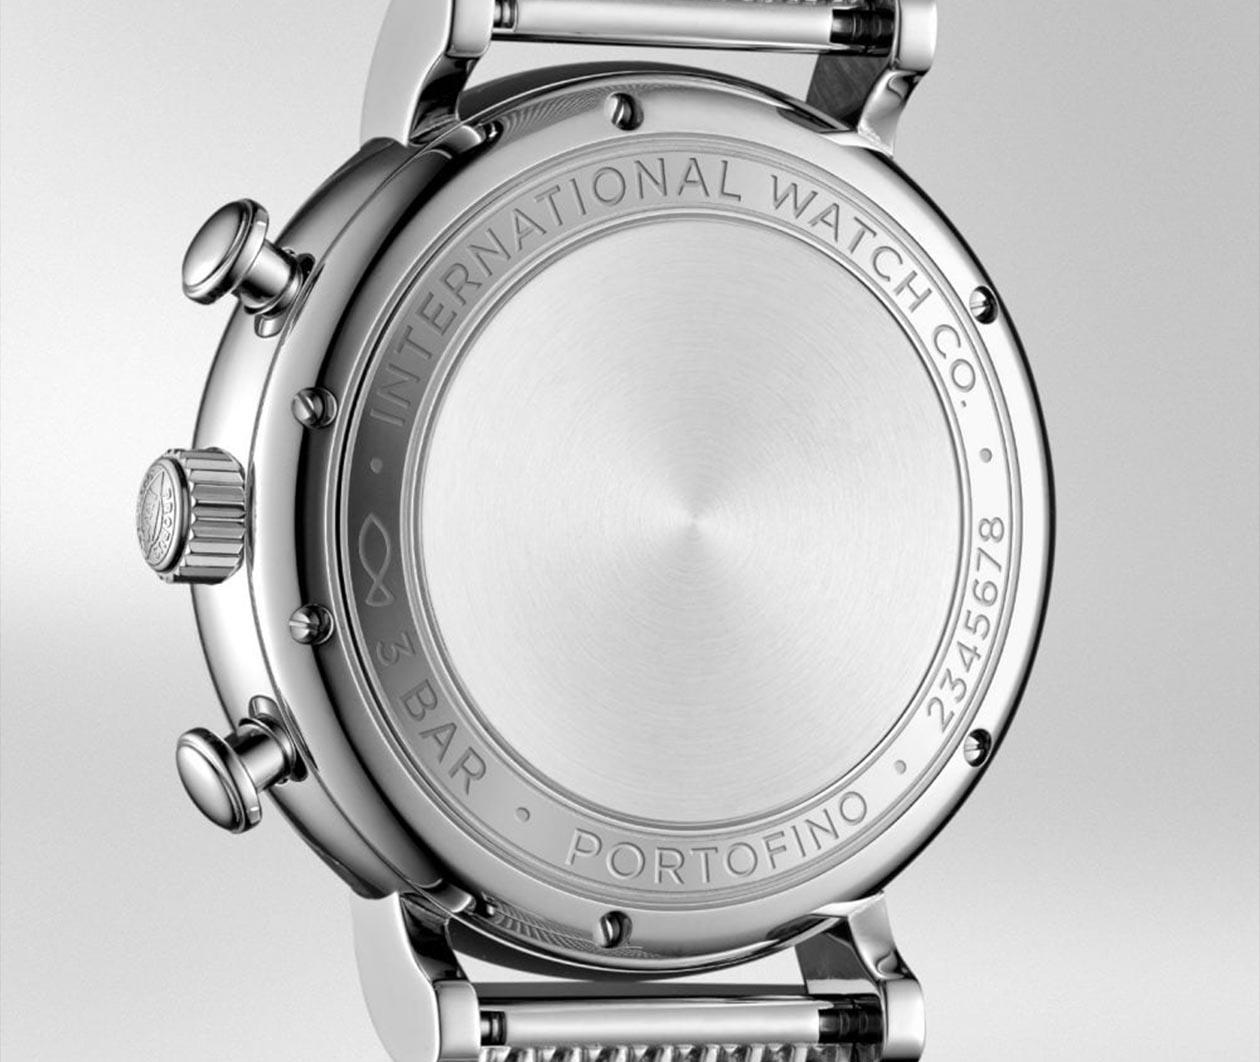 IWC Portofino Chronograph IW391030 Carousel 5 FINAL